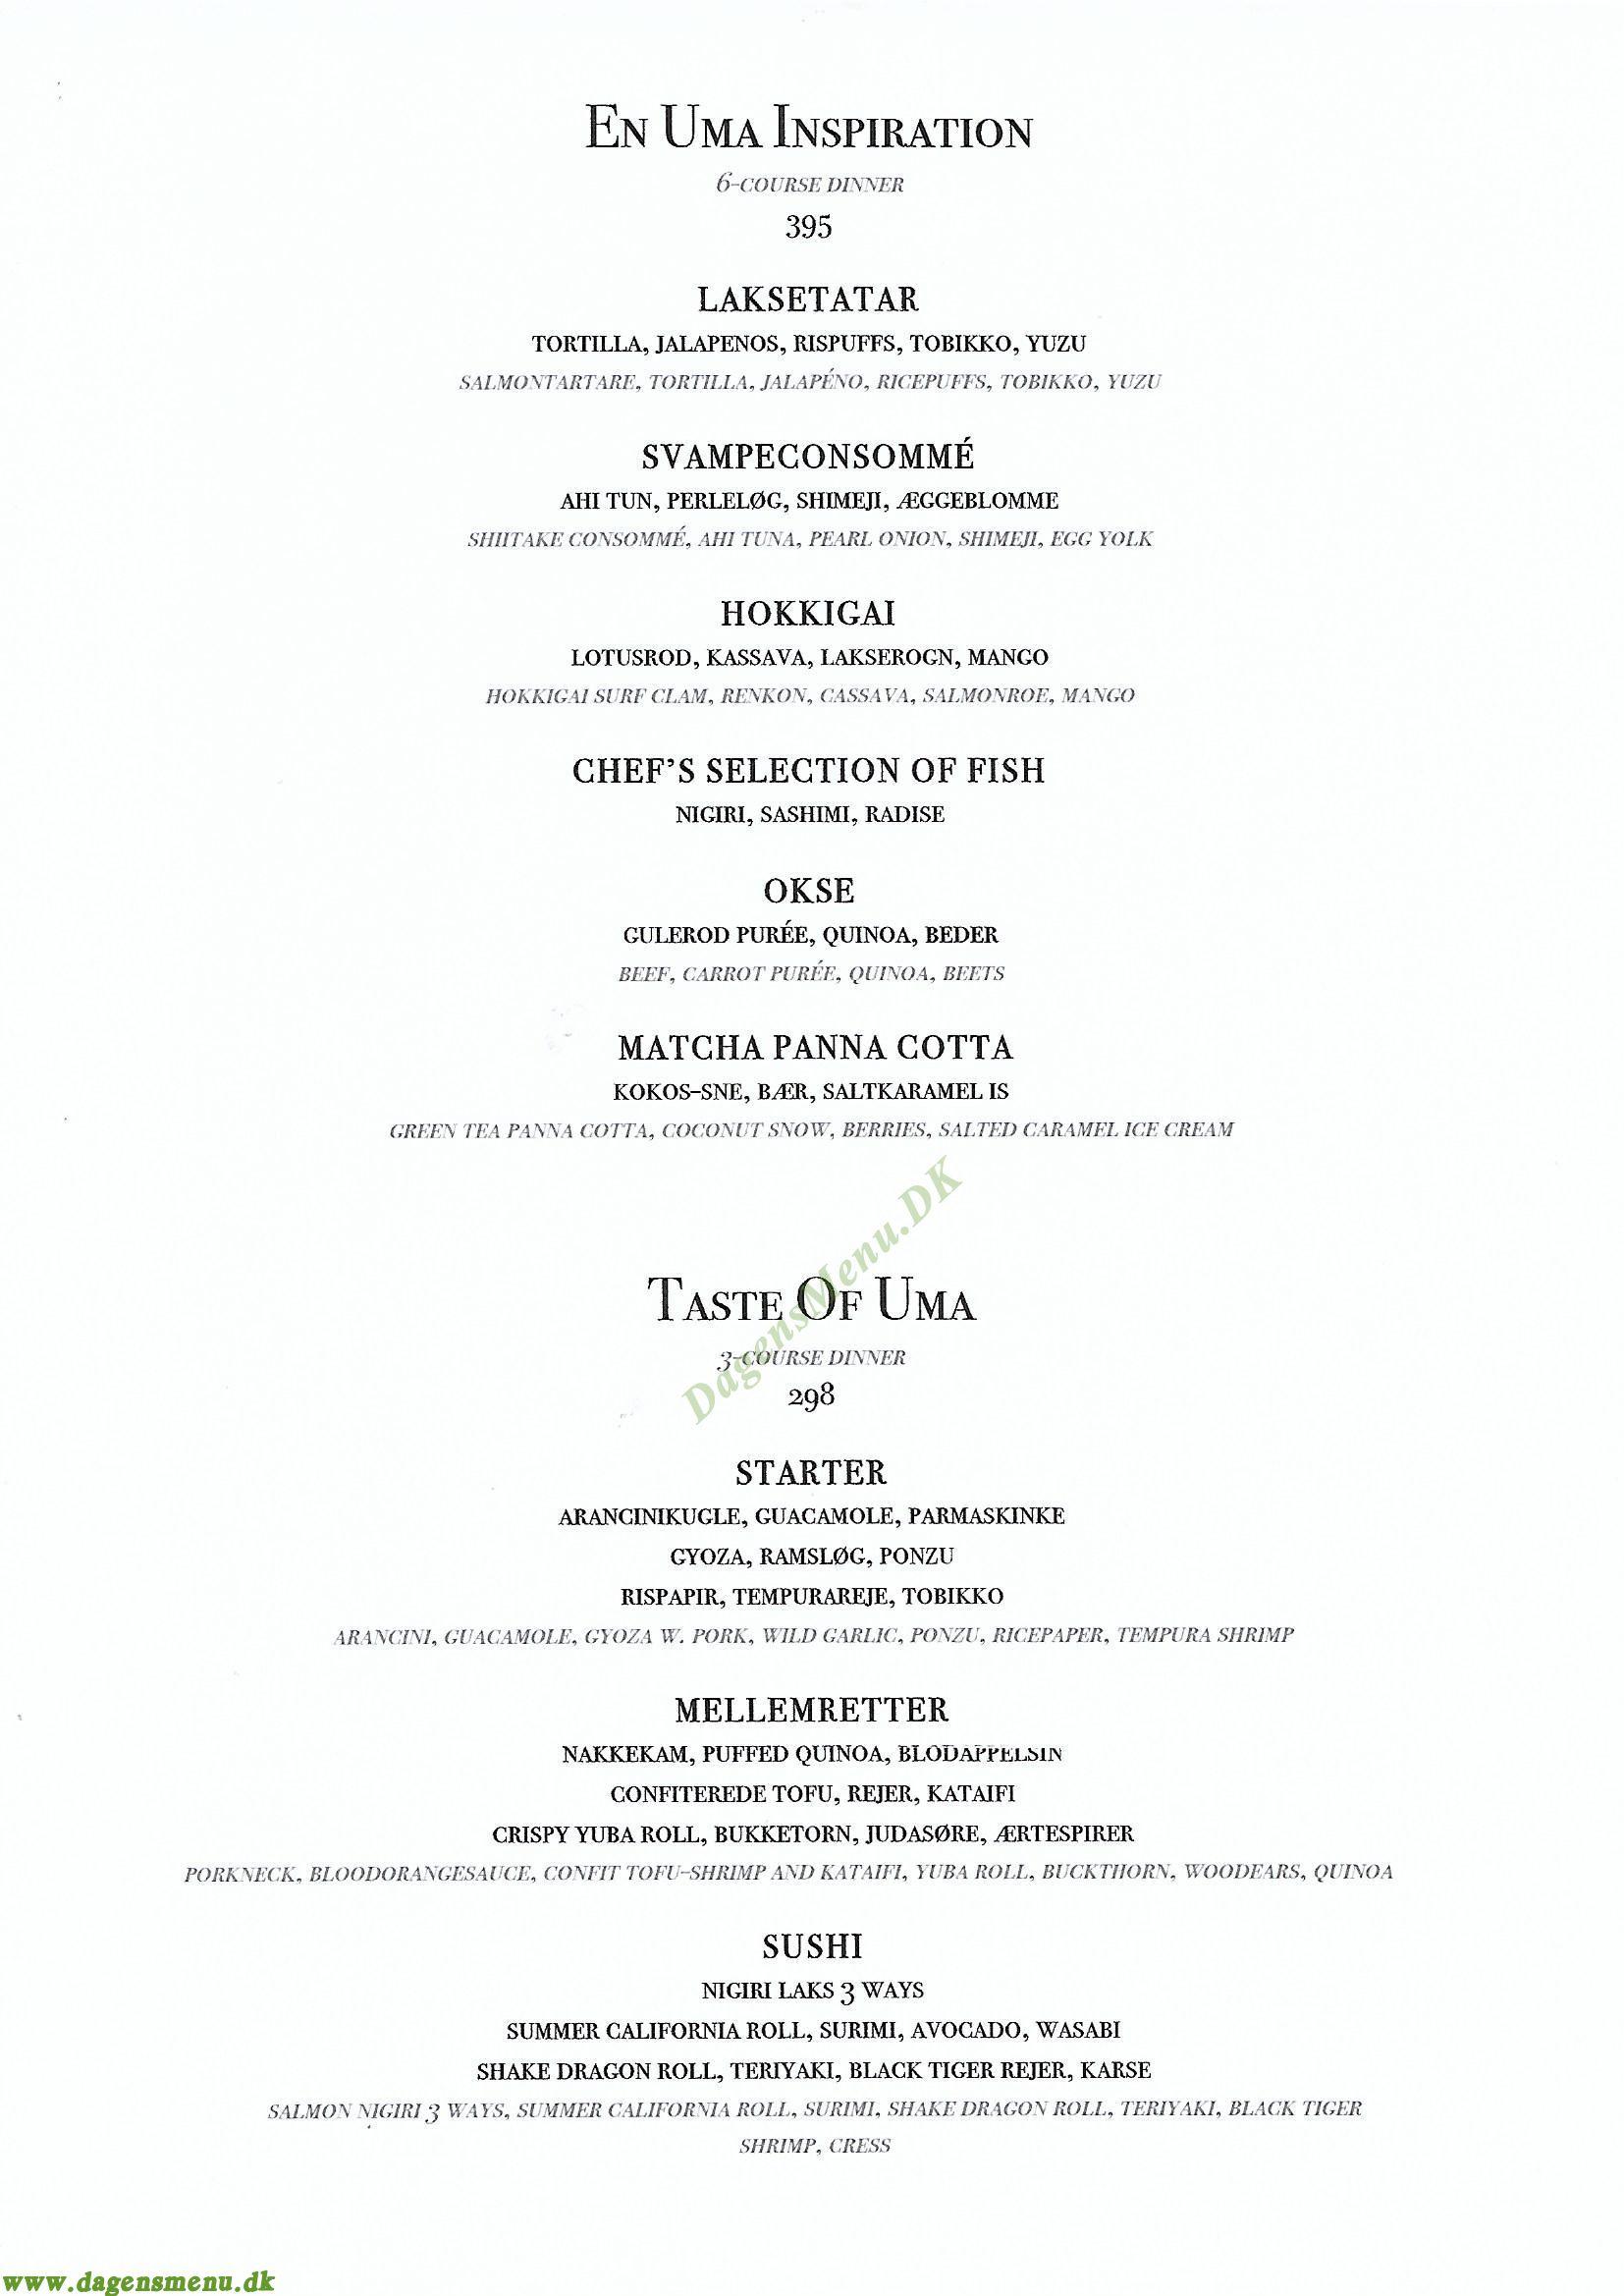 Restaurant Uma - Menukort